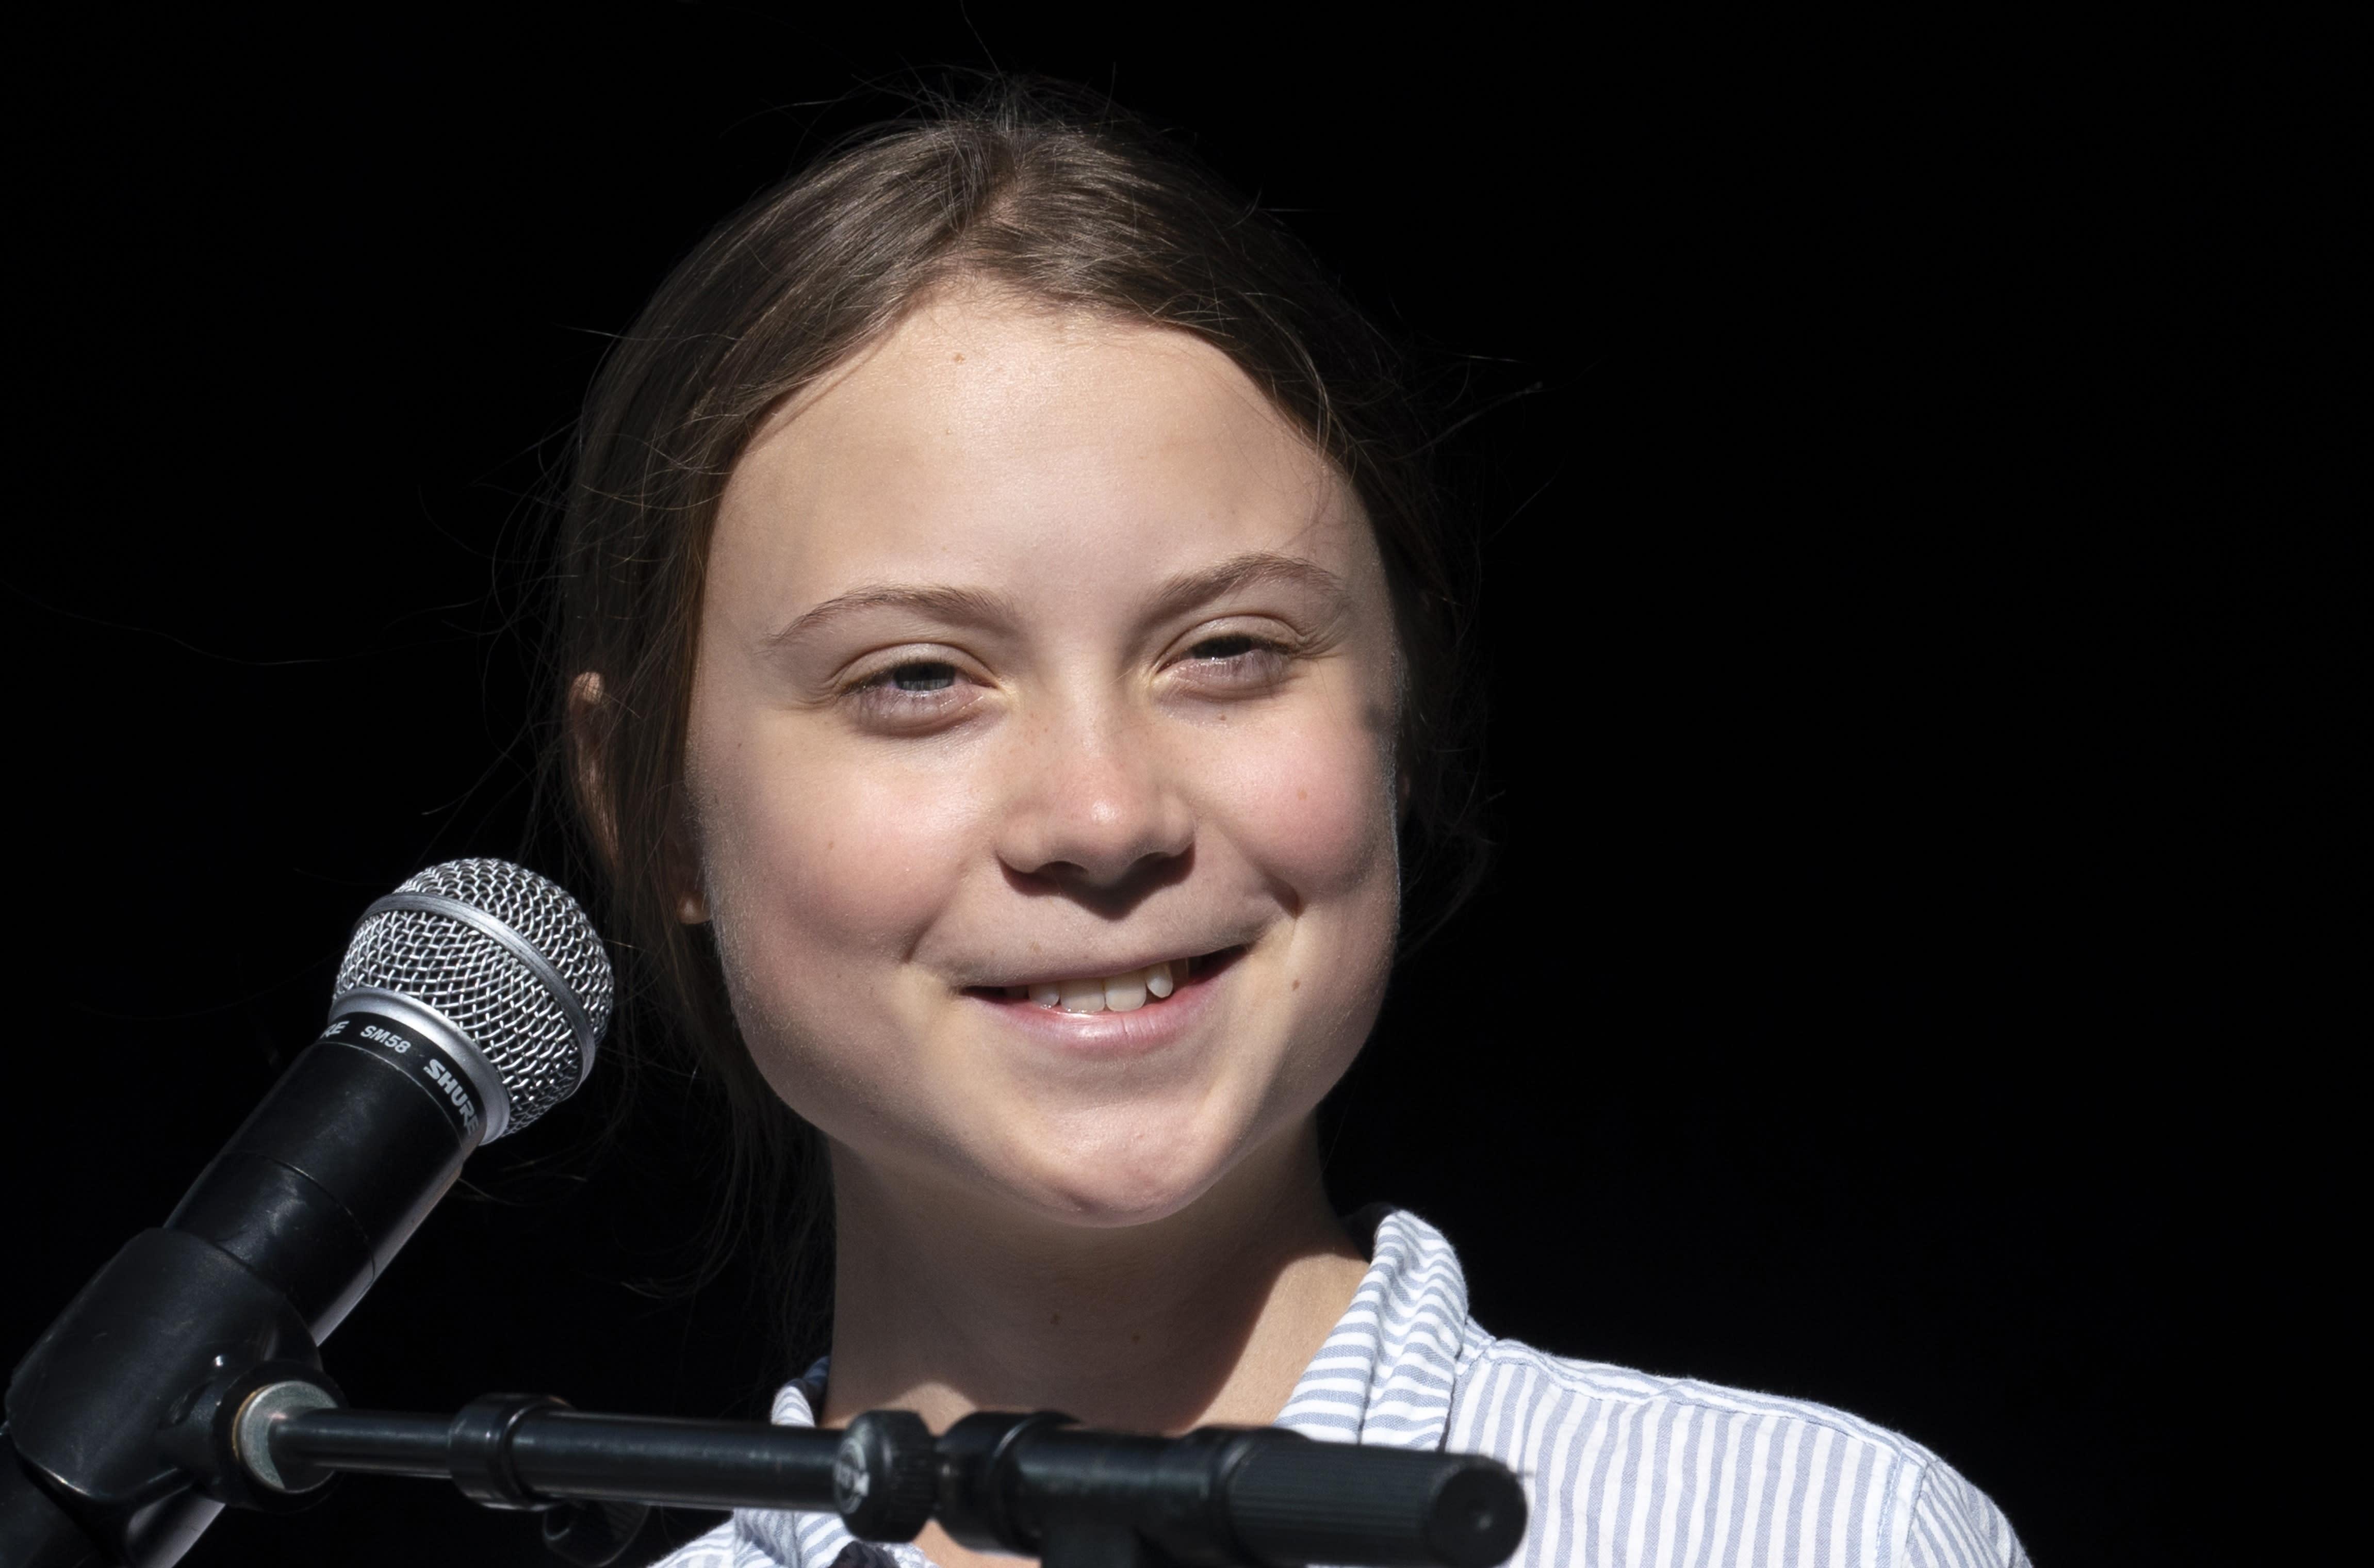 Greta Thunberg visits South Dakota Monday for climate rally